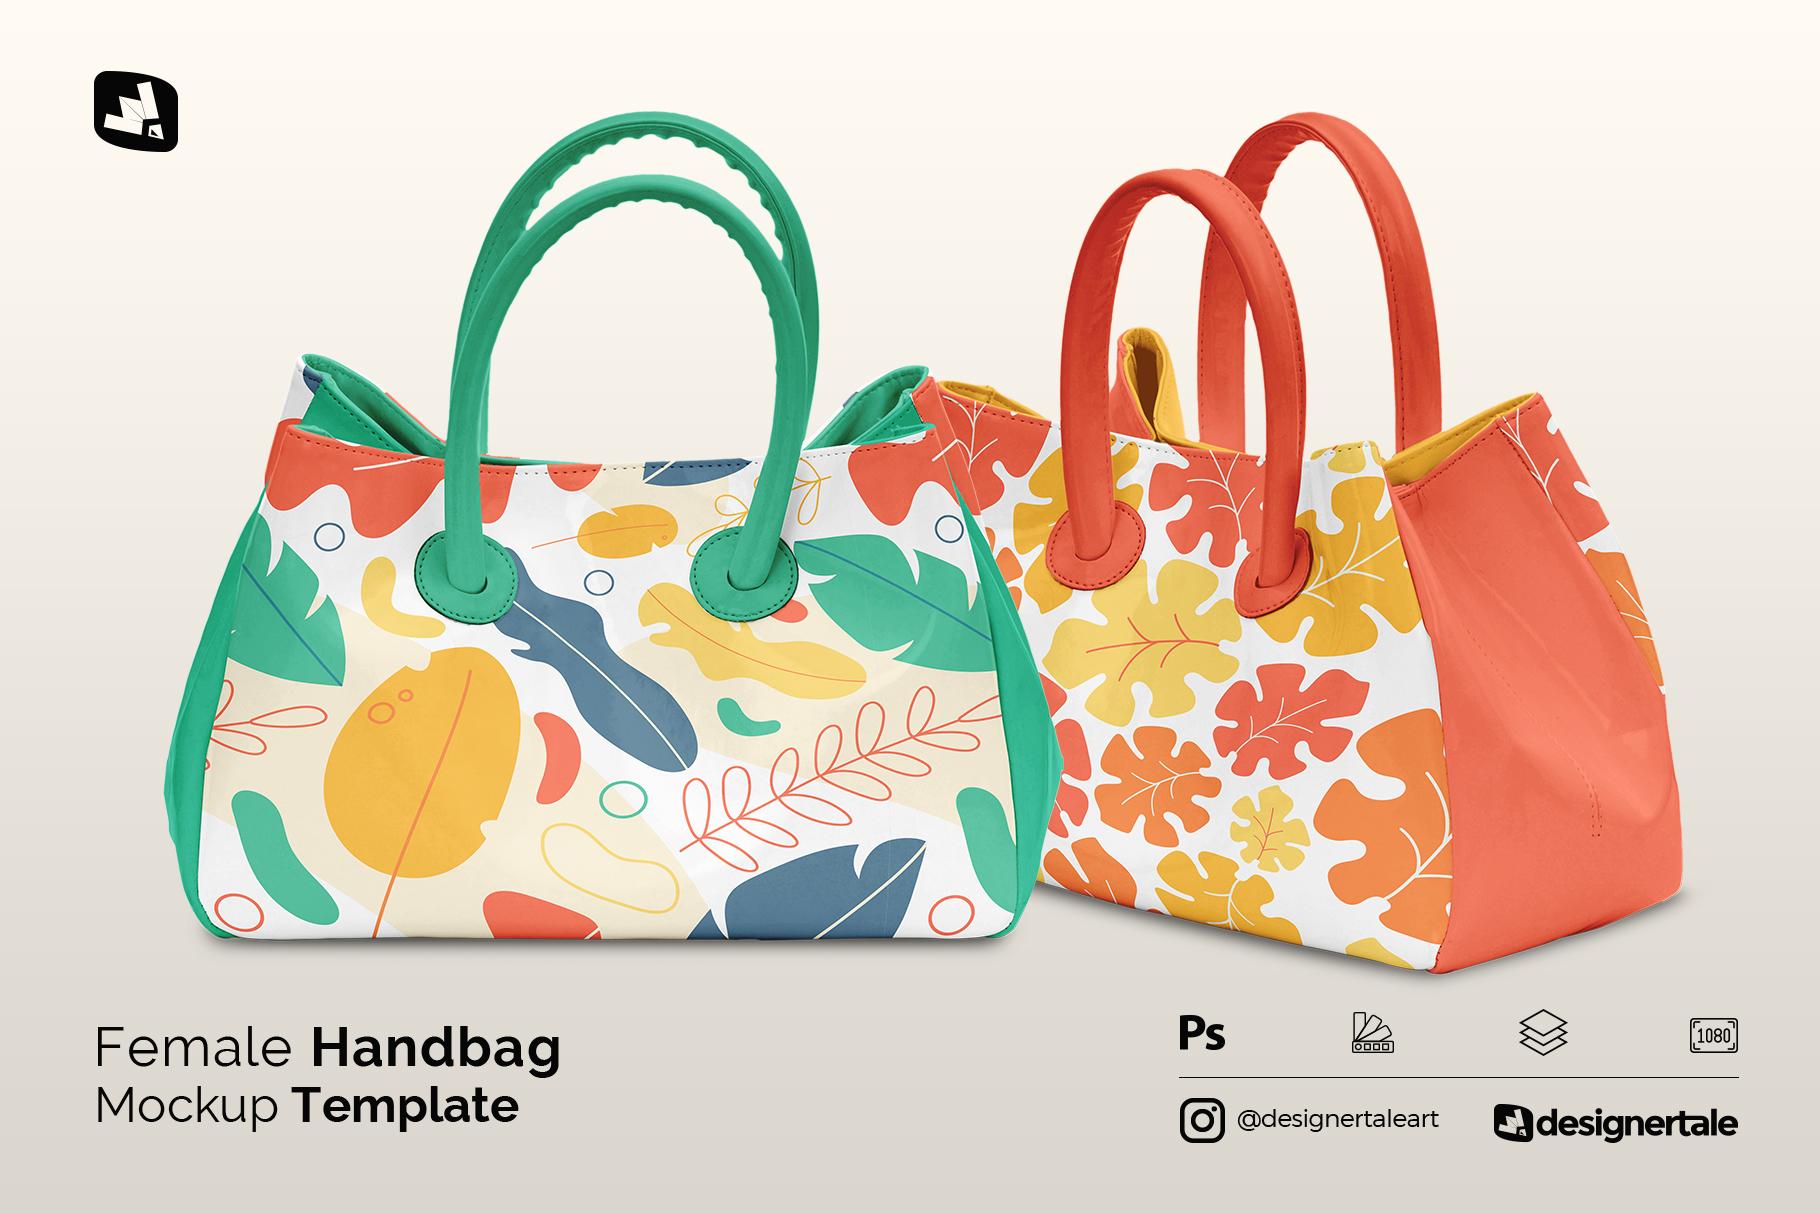 Female Handbag Mockup